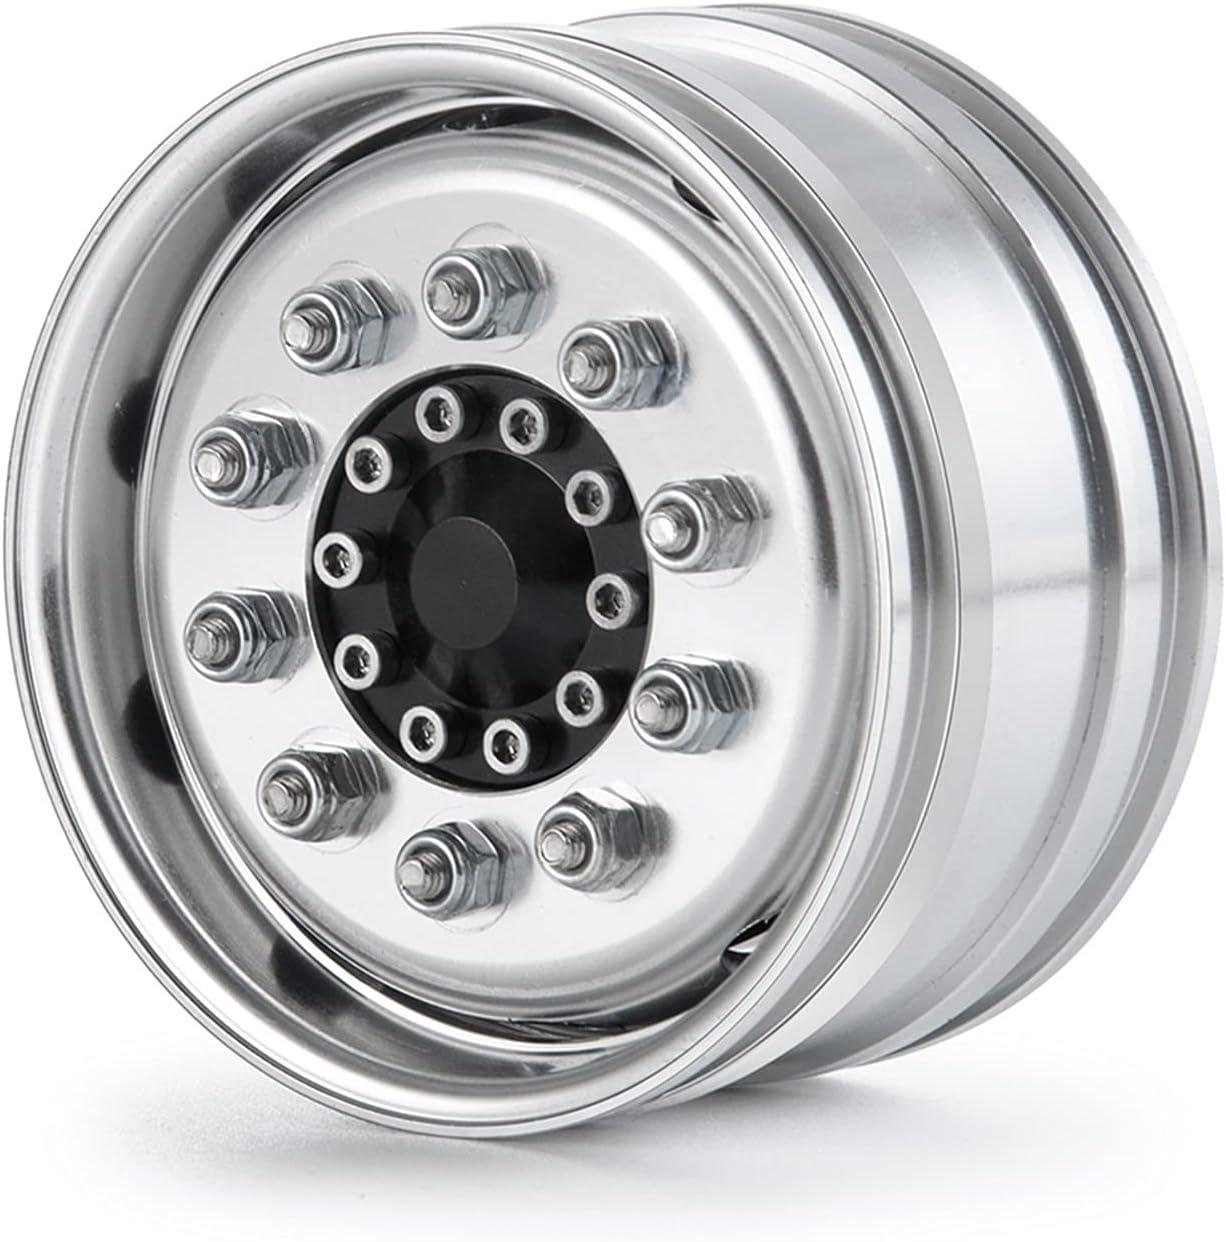 1 2pcs Metal Beadlock Bearing Type Cheap bargain OFFicial for 0 Front Rims Wheel Hubs